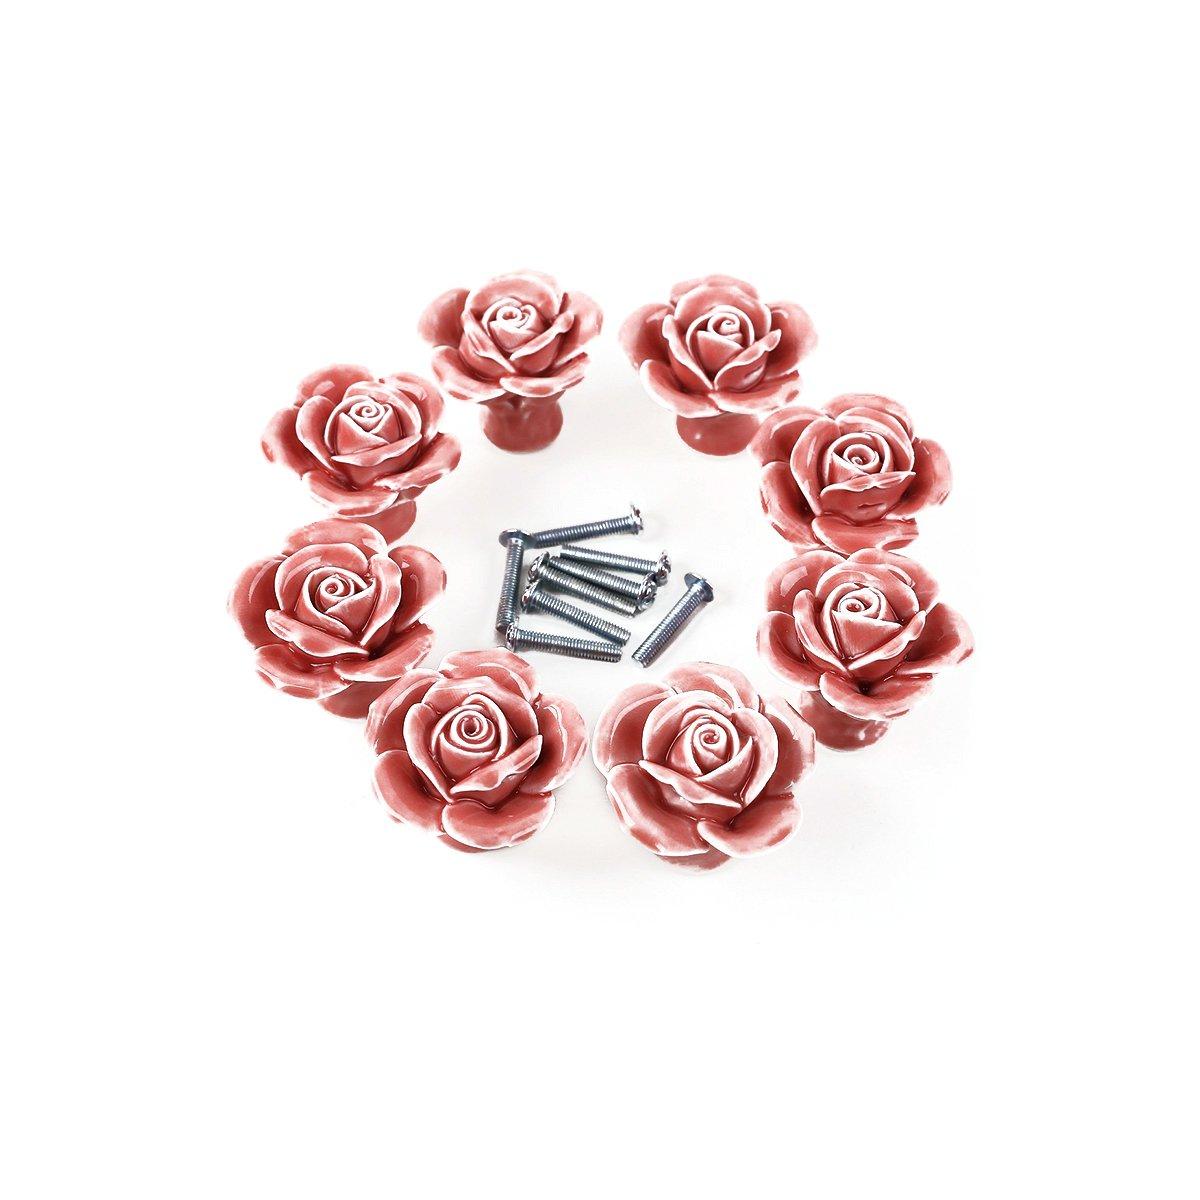 NUOLUX 8pcs Rose Shaped Ceramic Kitchen Cupboard Cabinet Drawer Door Knobs(Pink)